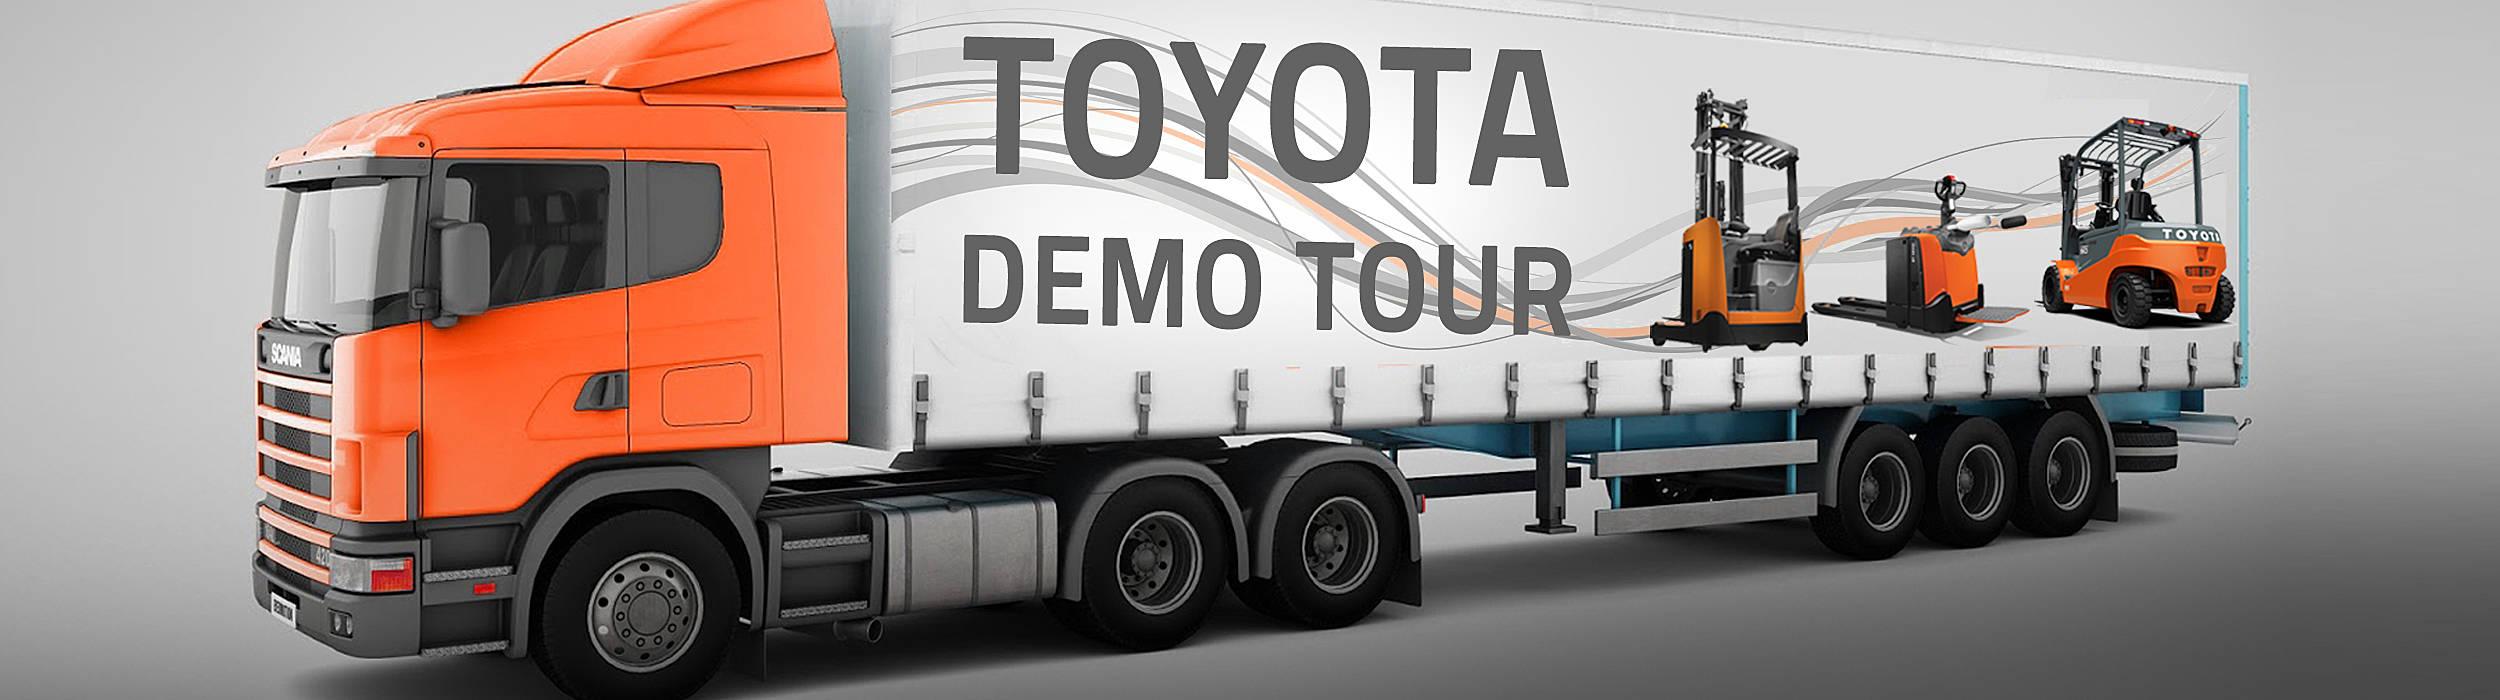 Toyota Demo Tour